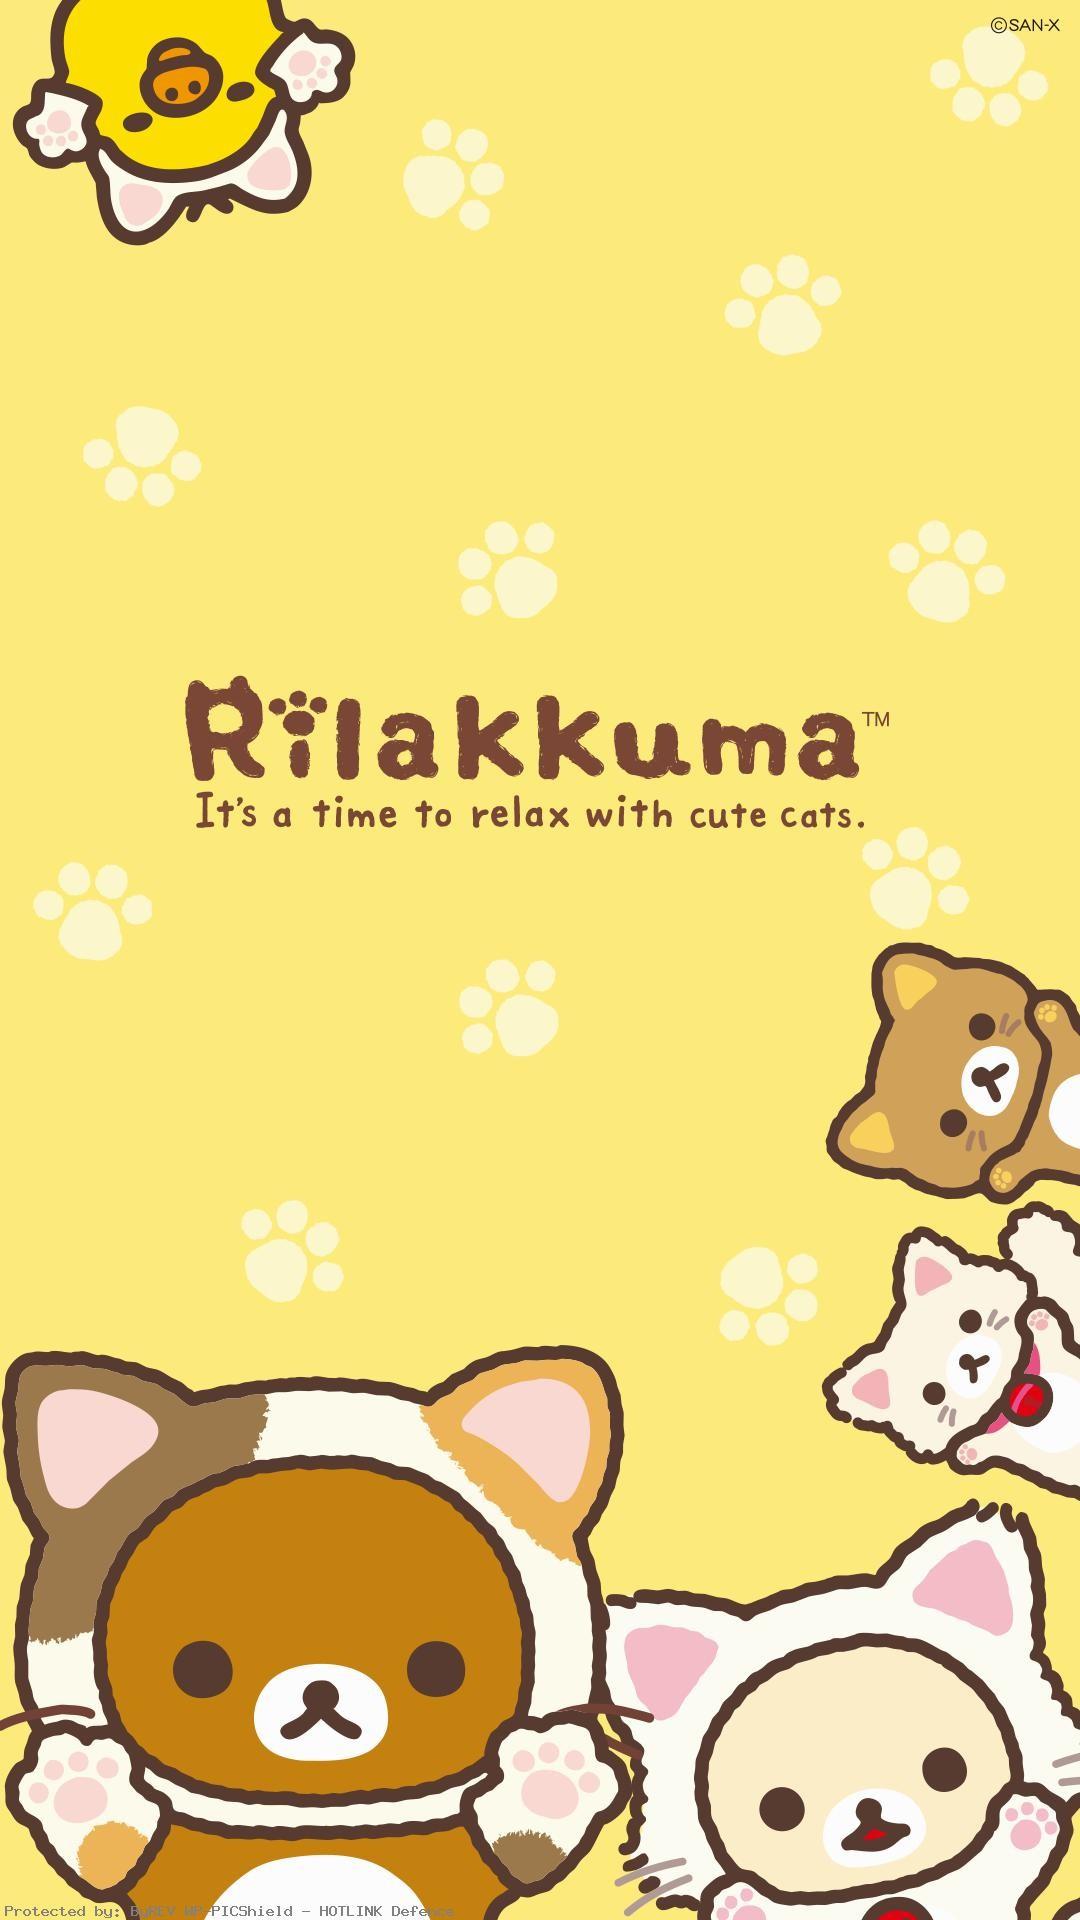 Rilakkuma-Cat-Series-Phone-%E2%80%A2-1080×1920